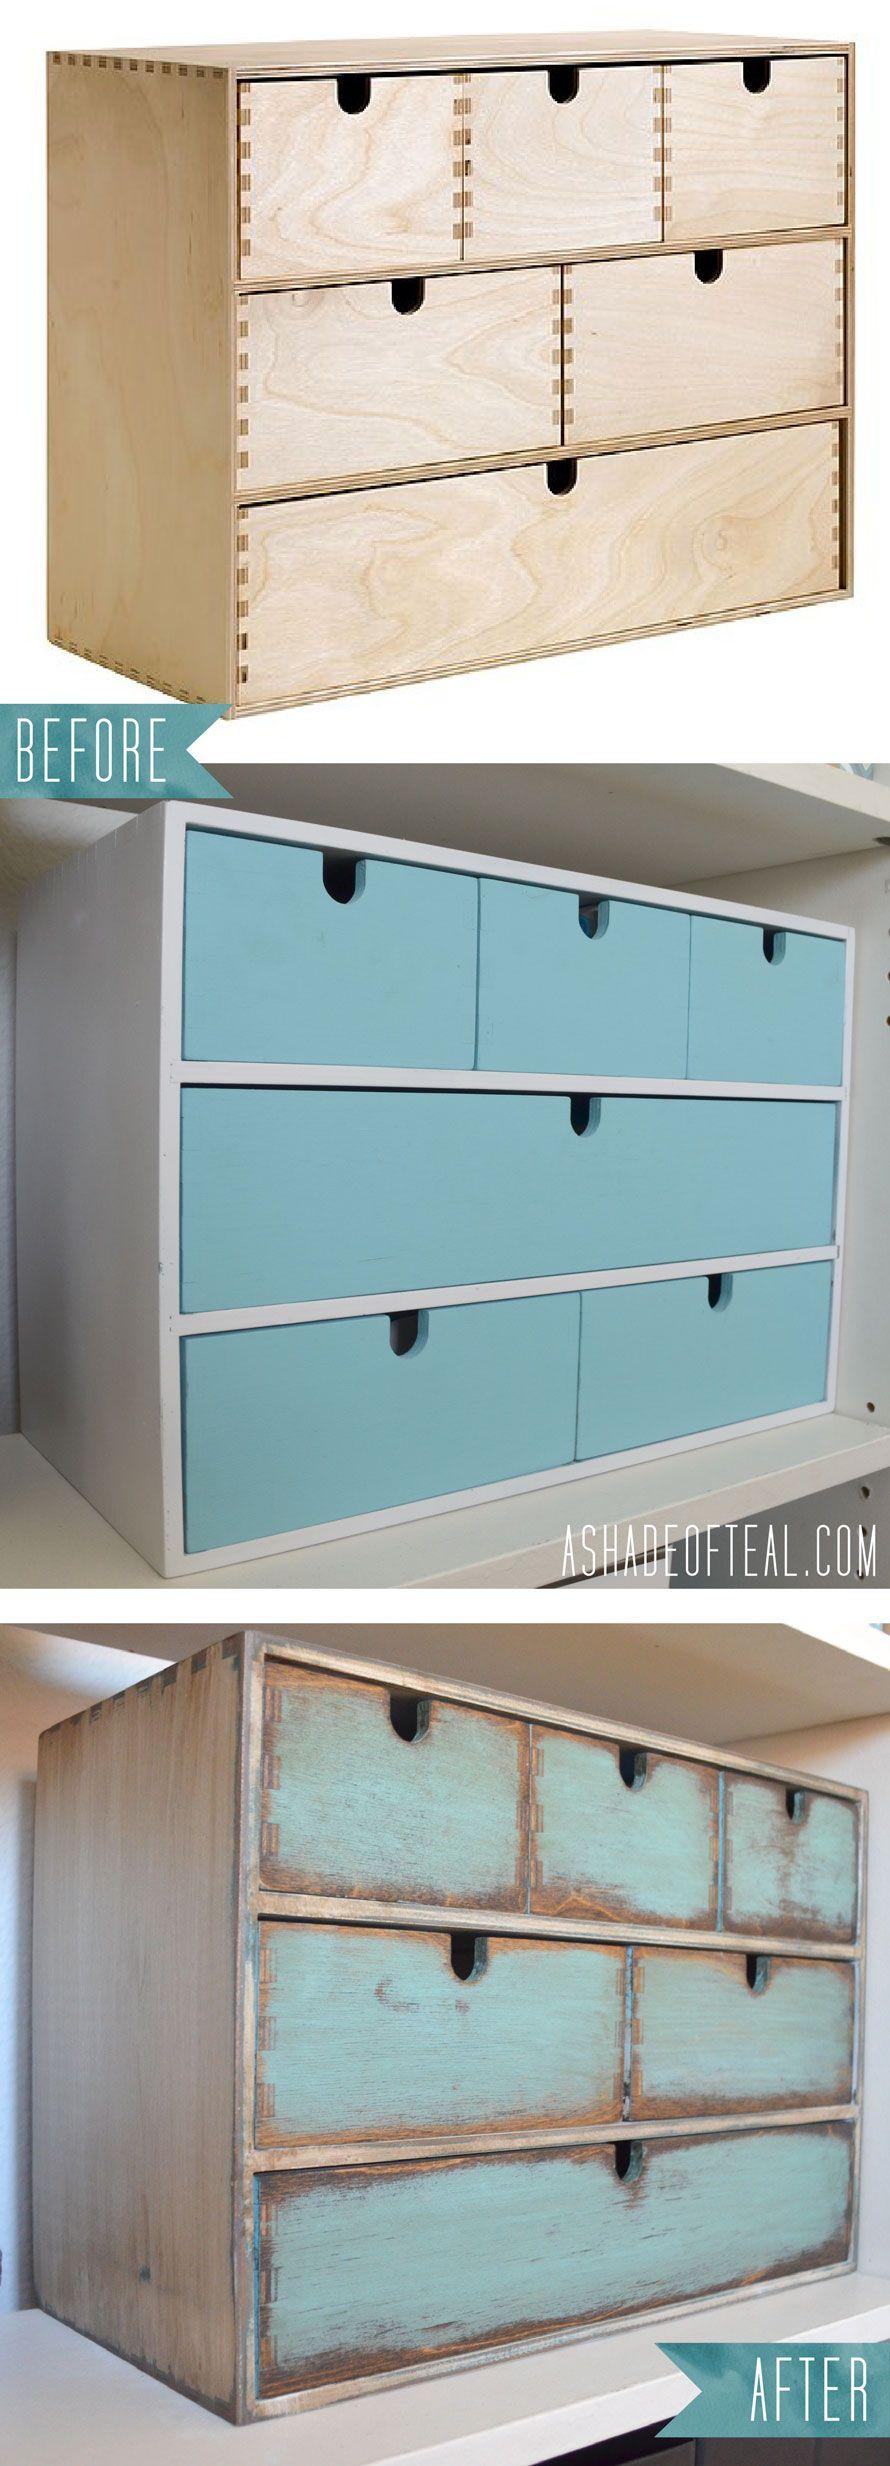 another ikea update moppe organizer makeover moppe pinterest m bel holzpaletten m bel. Black Bedroom Furniture Sets. Home Design Ideas